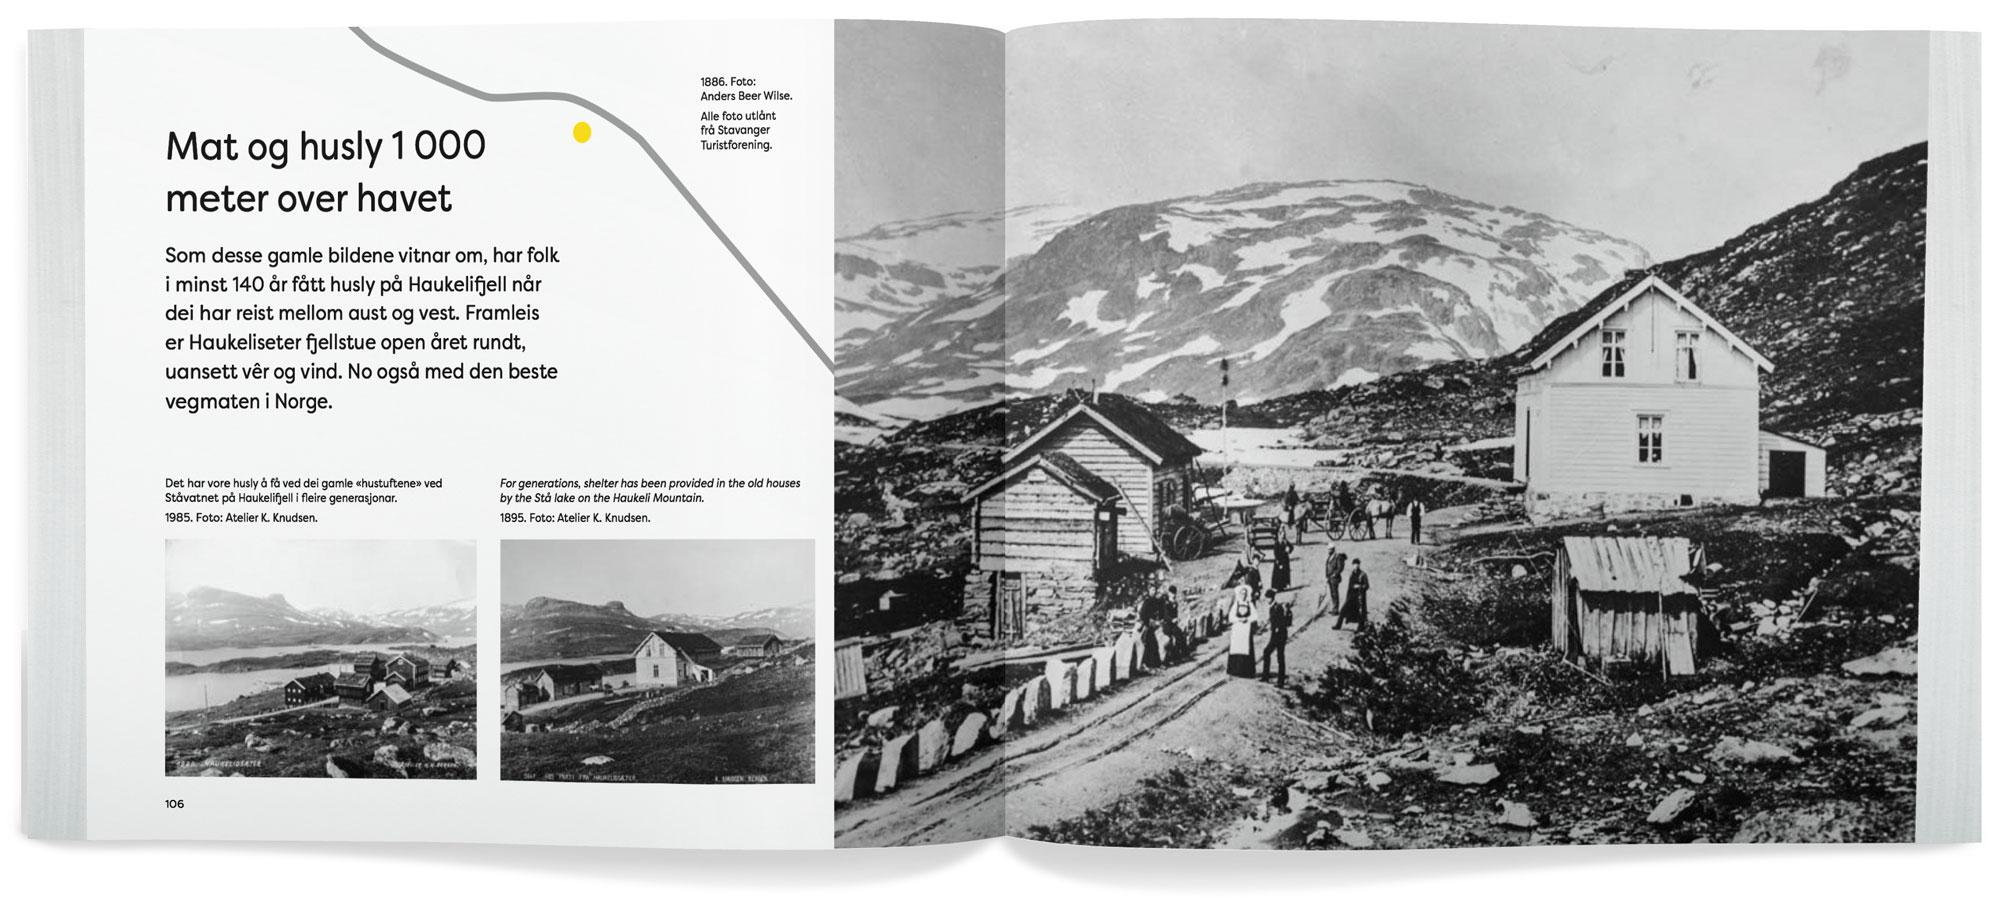 Plus-Book-8001-2017-10-15_1_2_3.jpg